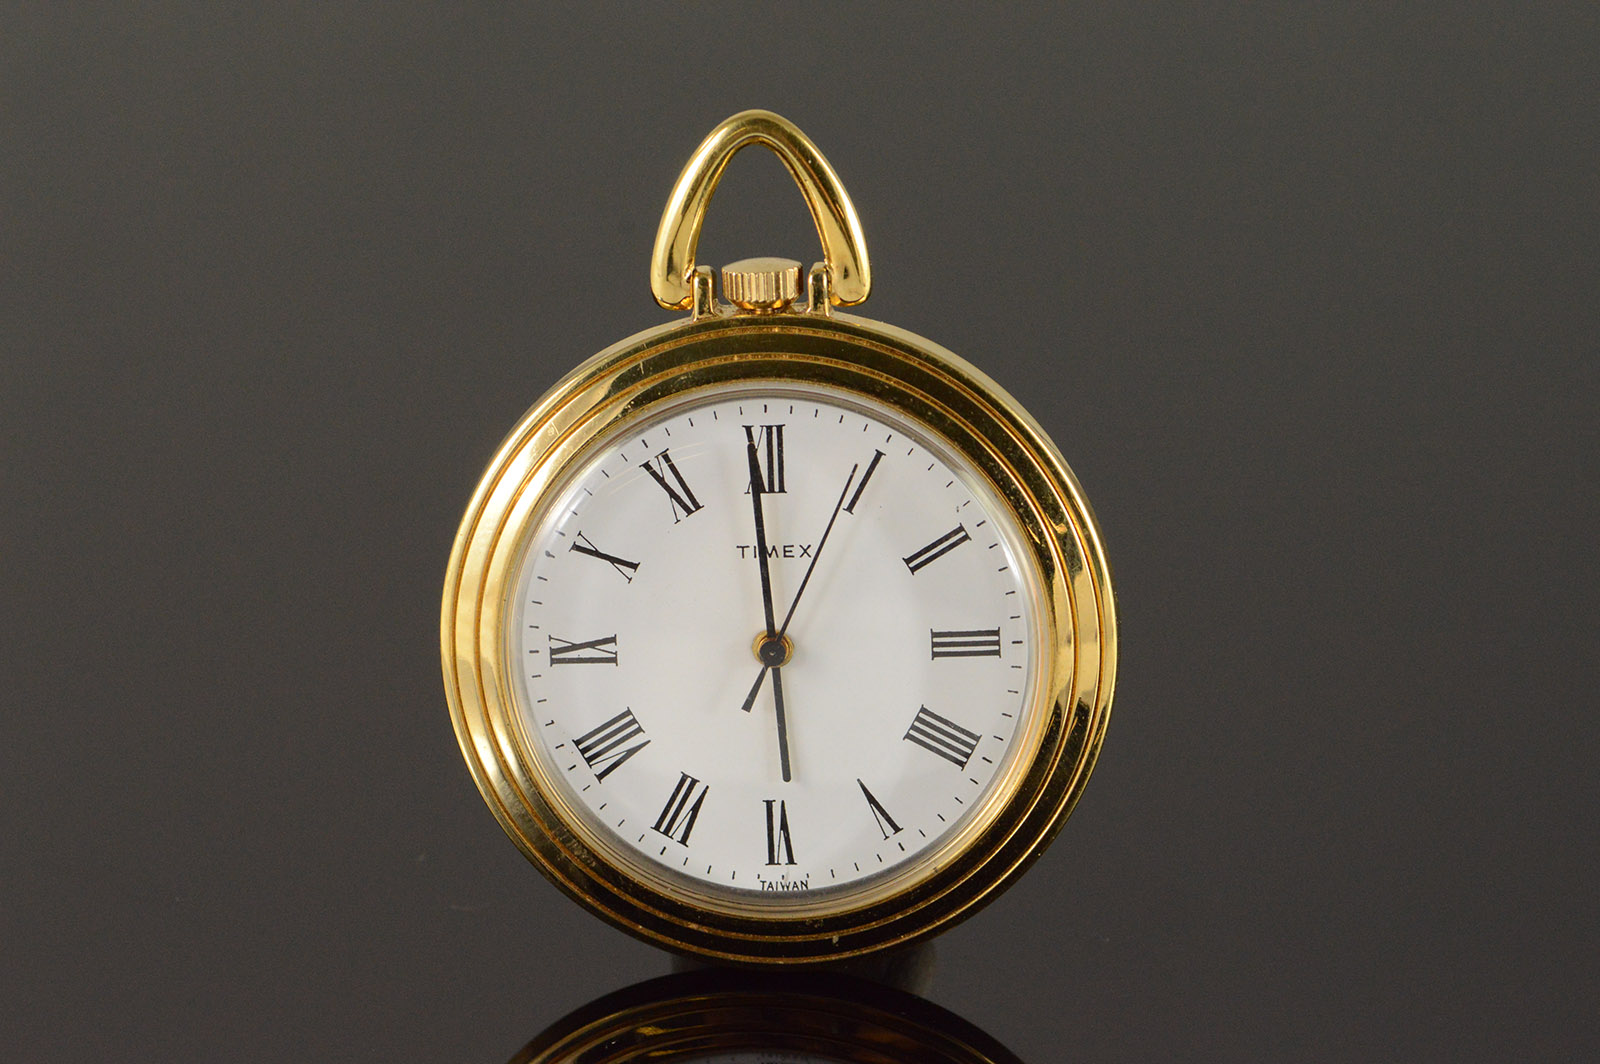 Timex 40mm Mechanical Pocket Watch | Property Room